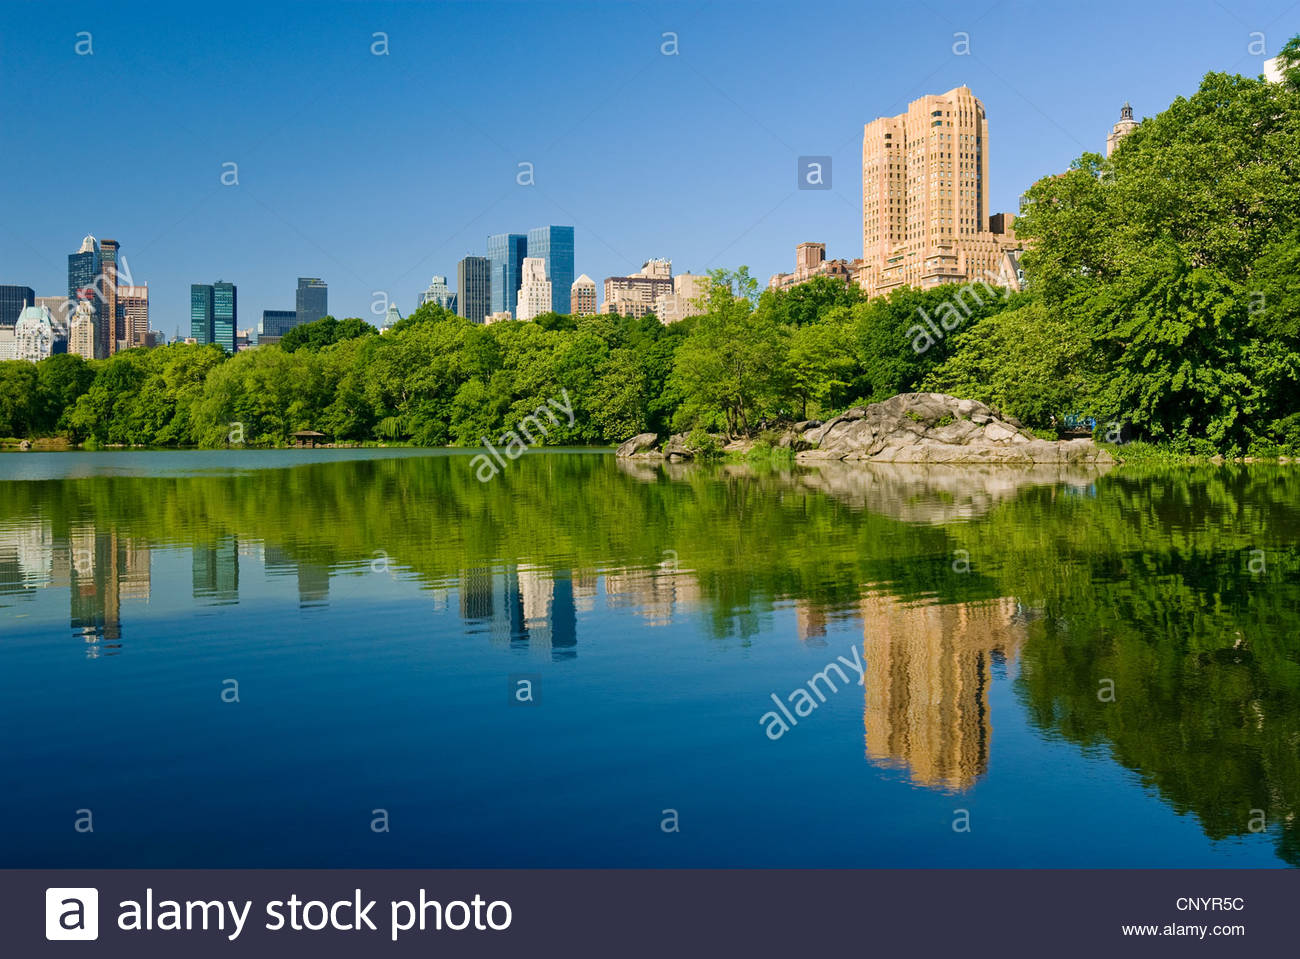 Central Park The Lake Midtown Manhattan Skyline Central Park West - Stock Image